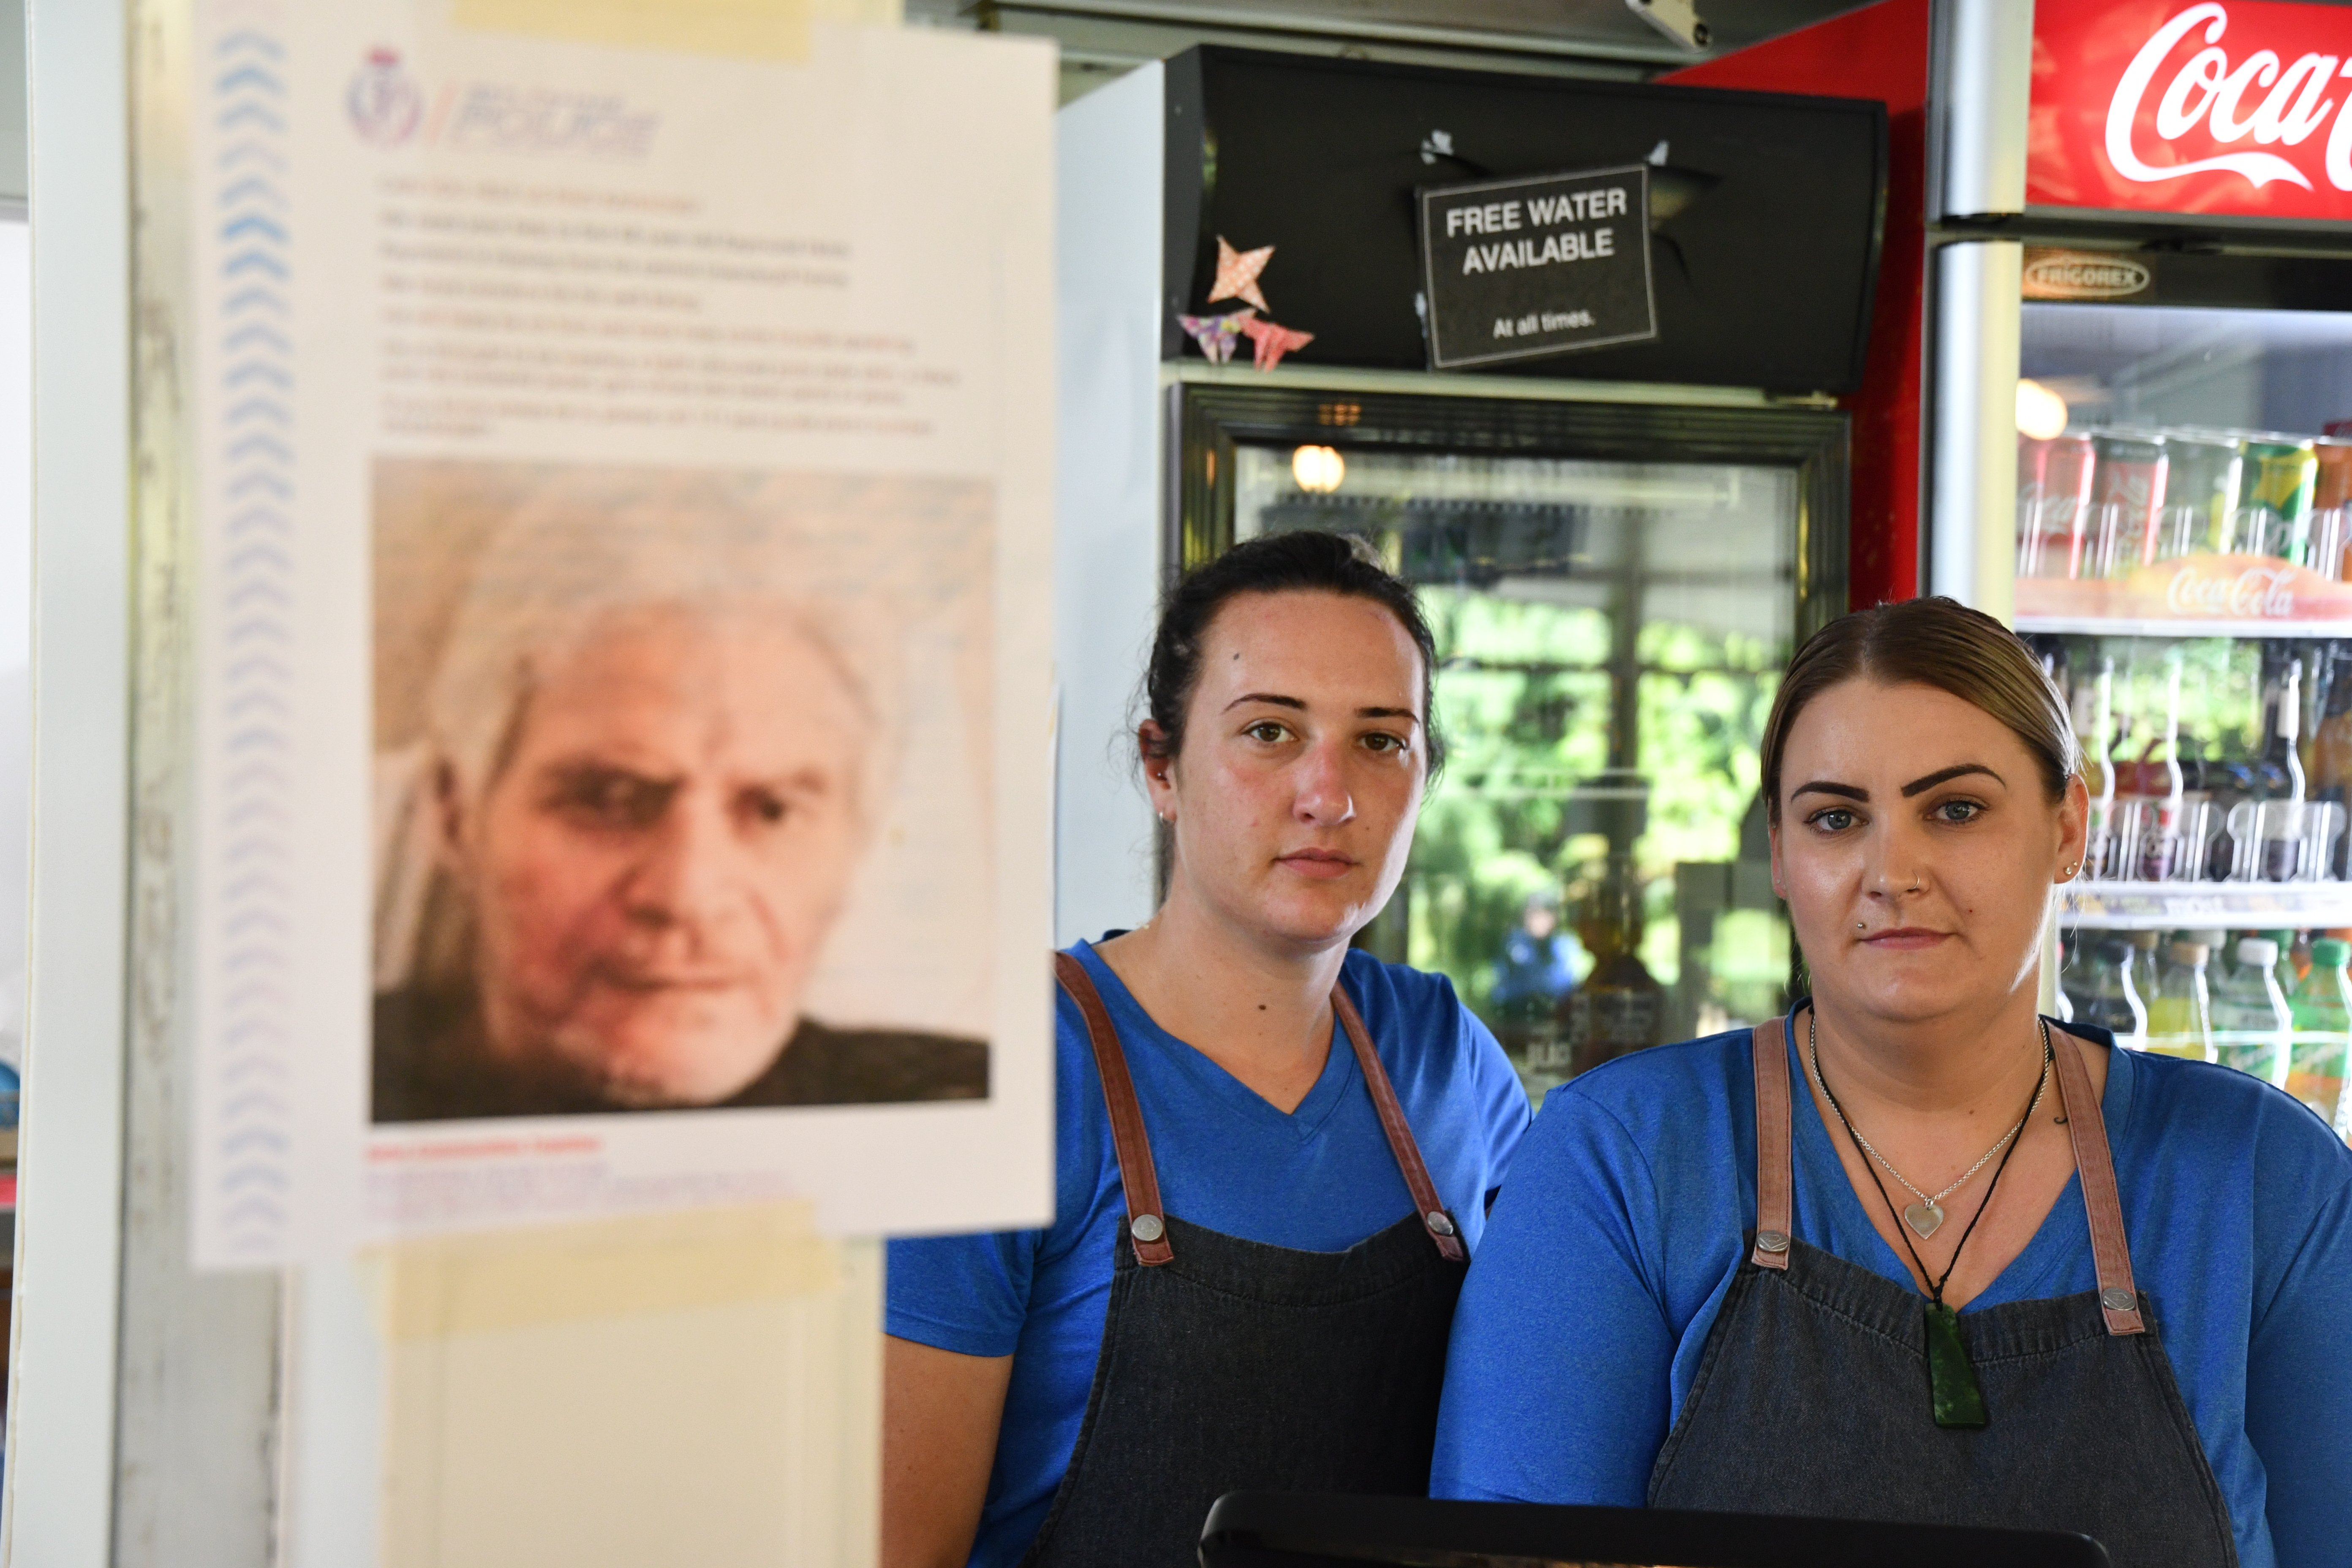 Cheeky Llama Cafe staff Toni Gorton (left) and Gemma Le Vaillant say most people are aware...